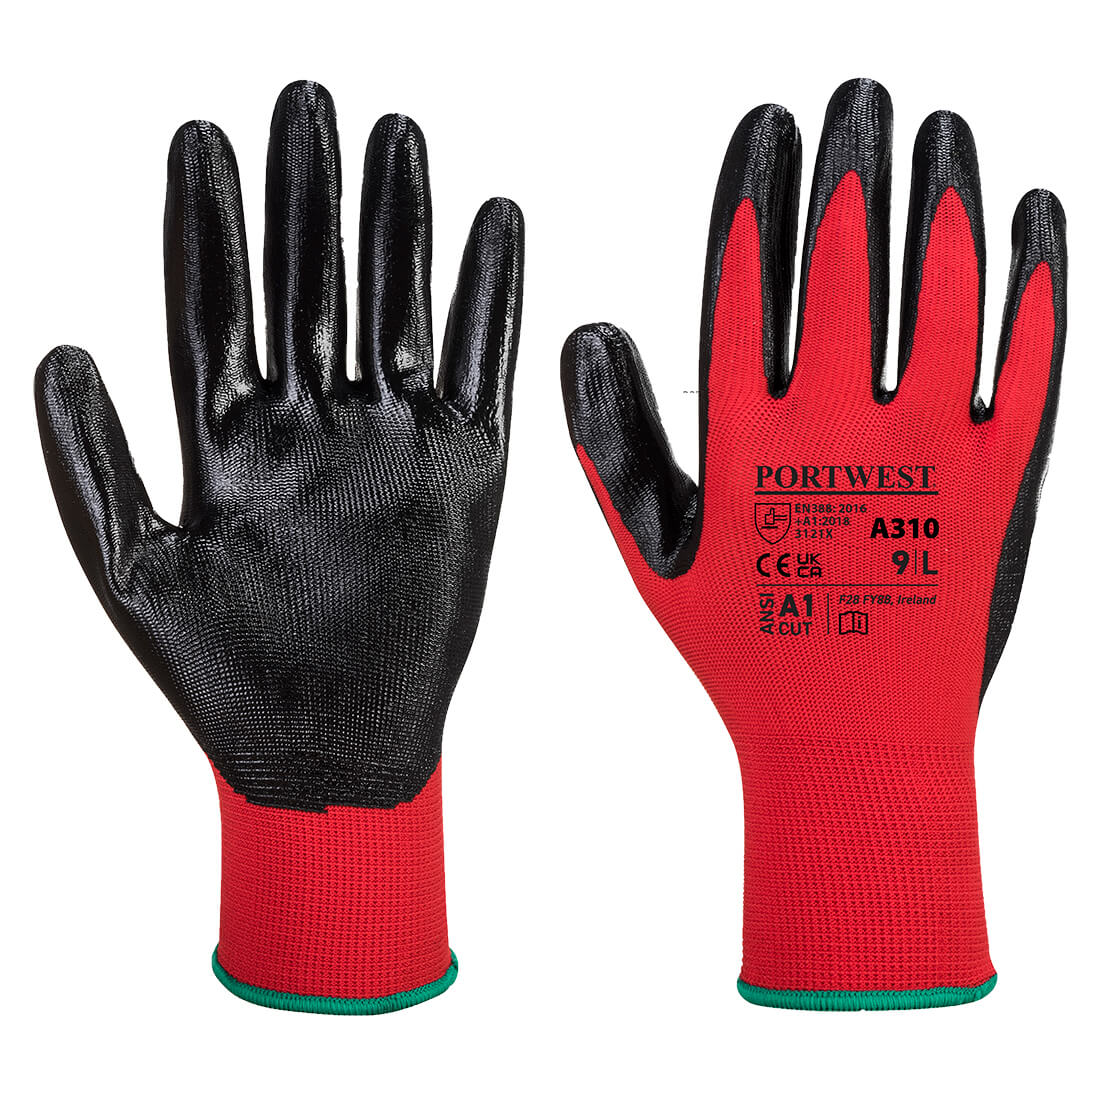 Flexo Grip Nitrile Glove Red/Black Medium